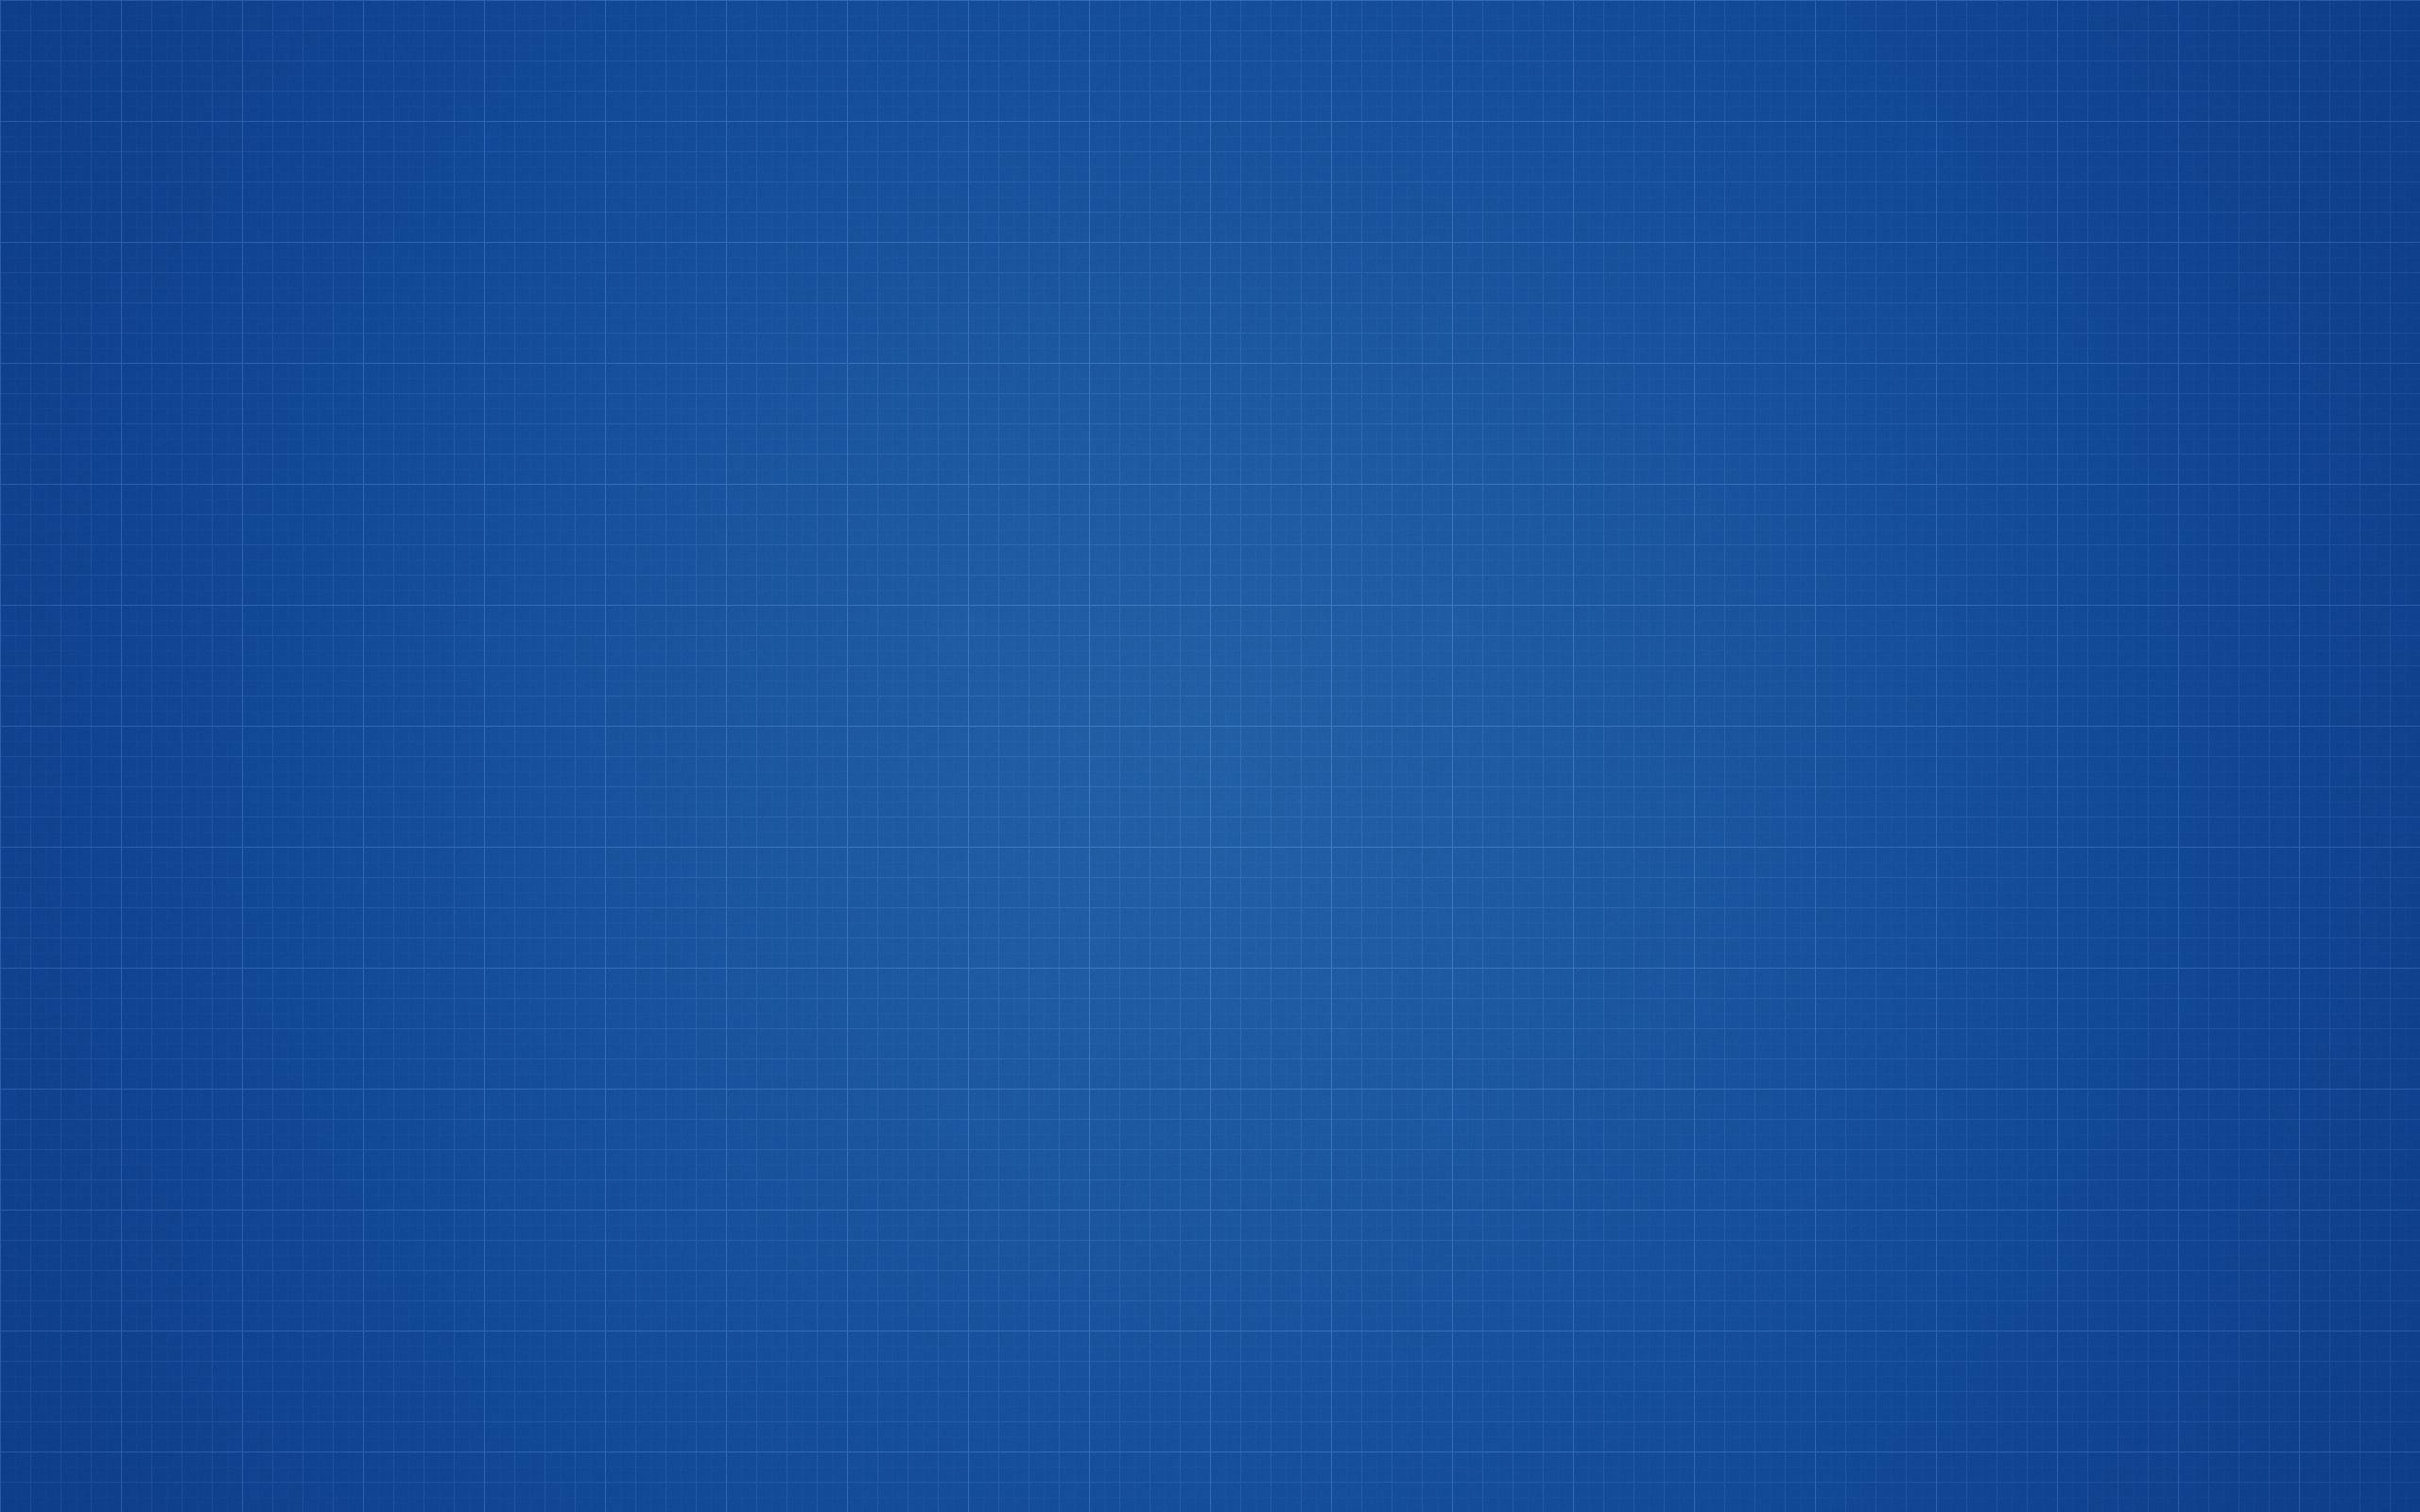 Download Blue Print Wallpaper Hd Backgrounds Download Itl Cat